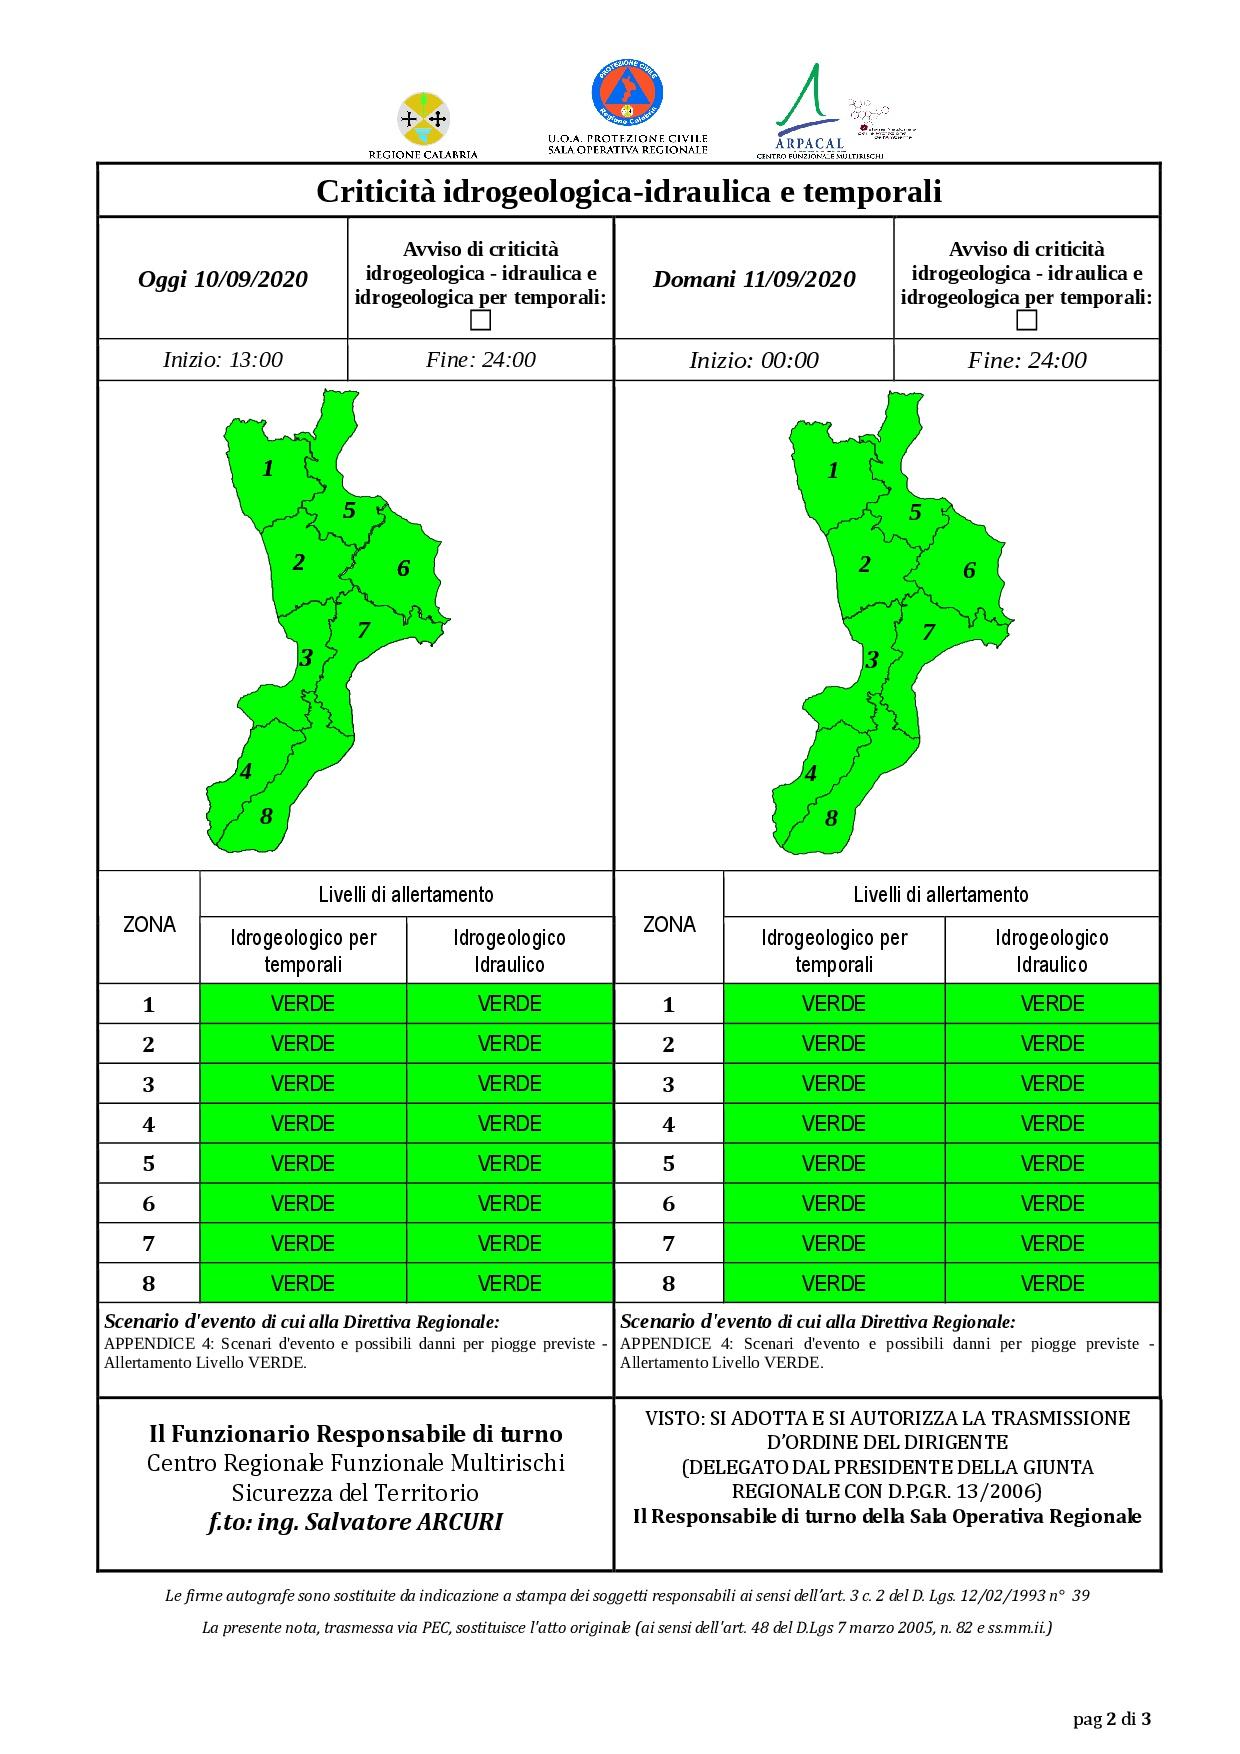 Criticità idrogeologica-idraulica e temporali in Calabria 10-09-2020